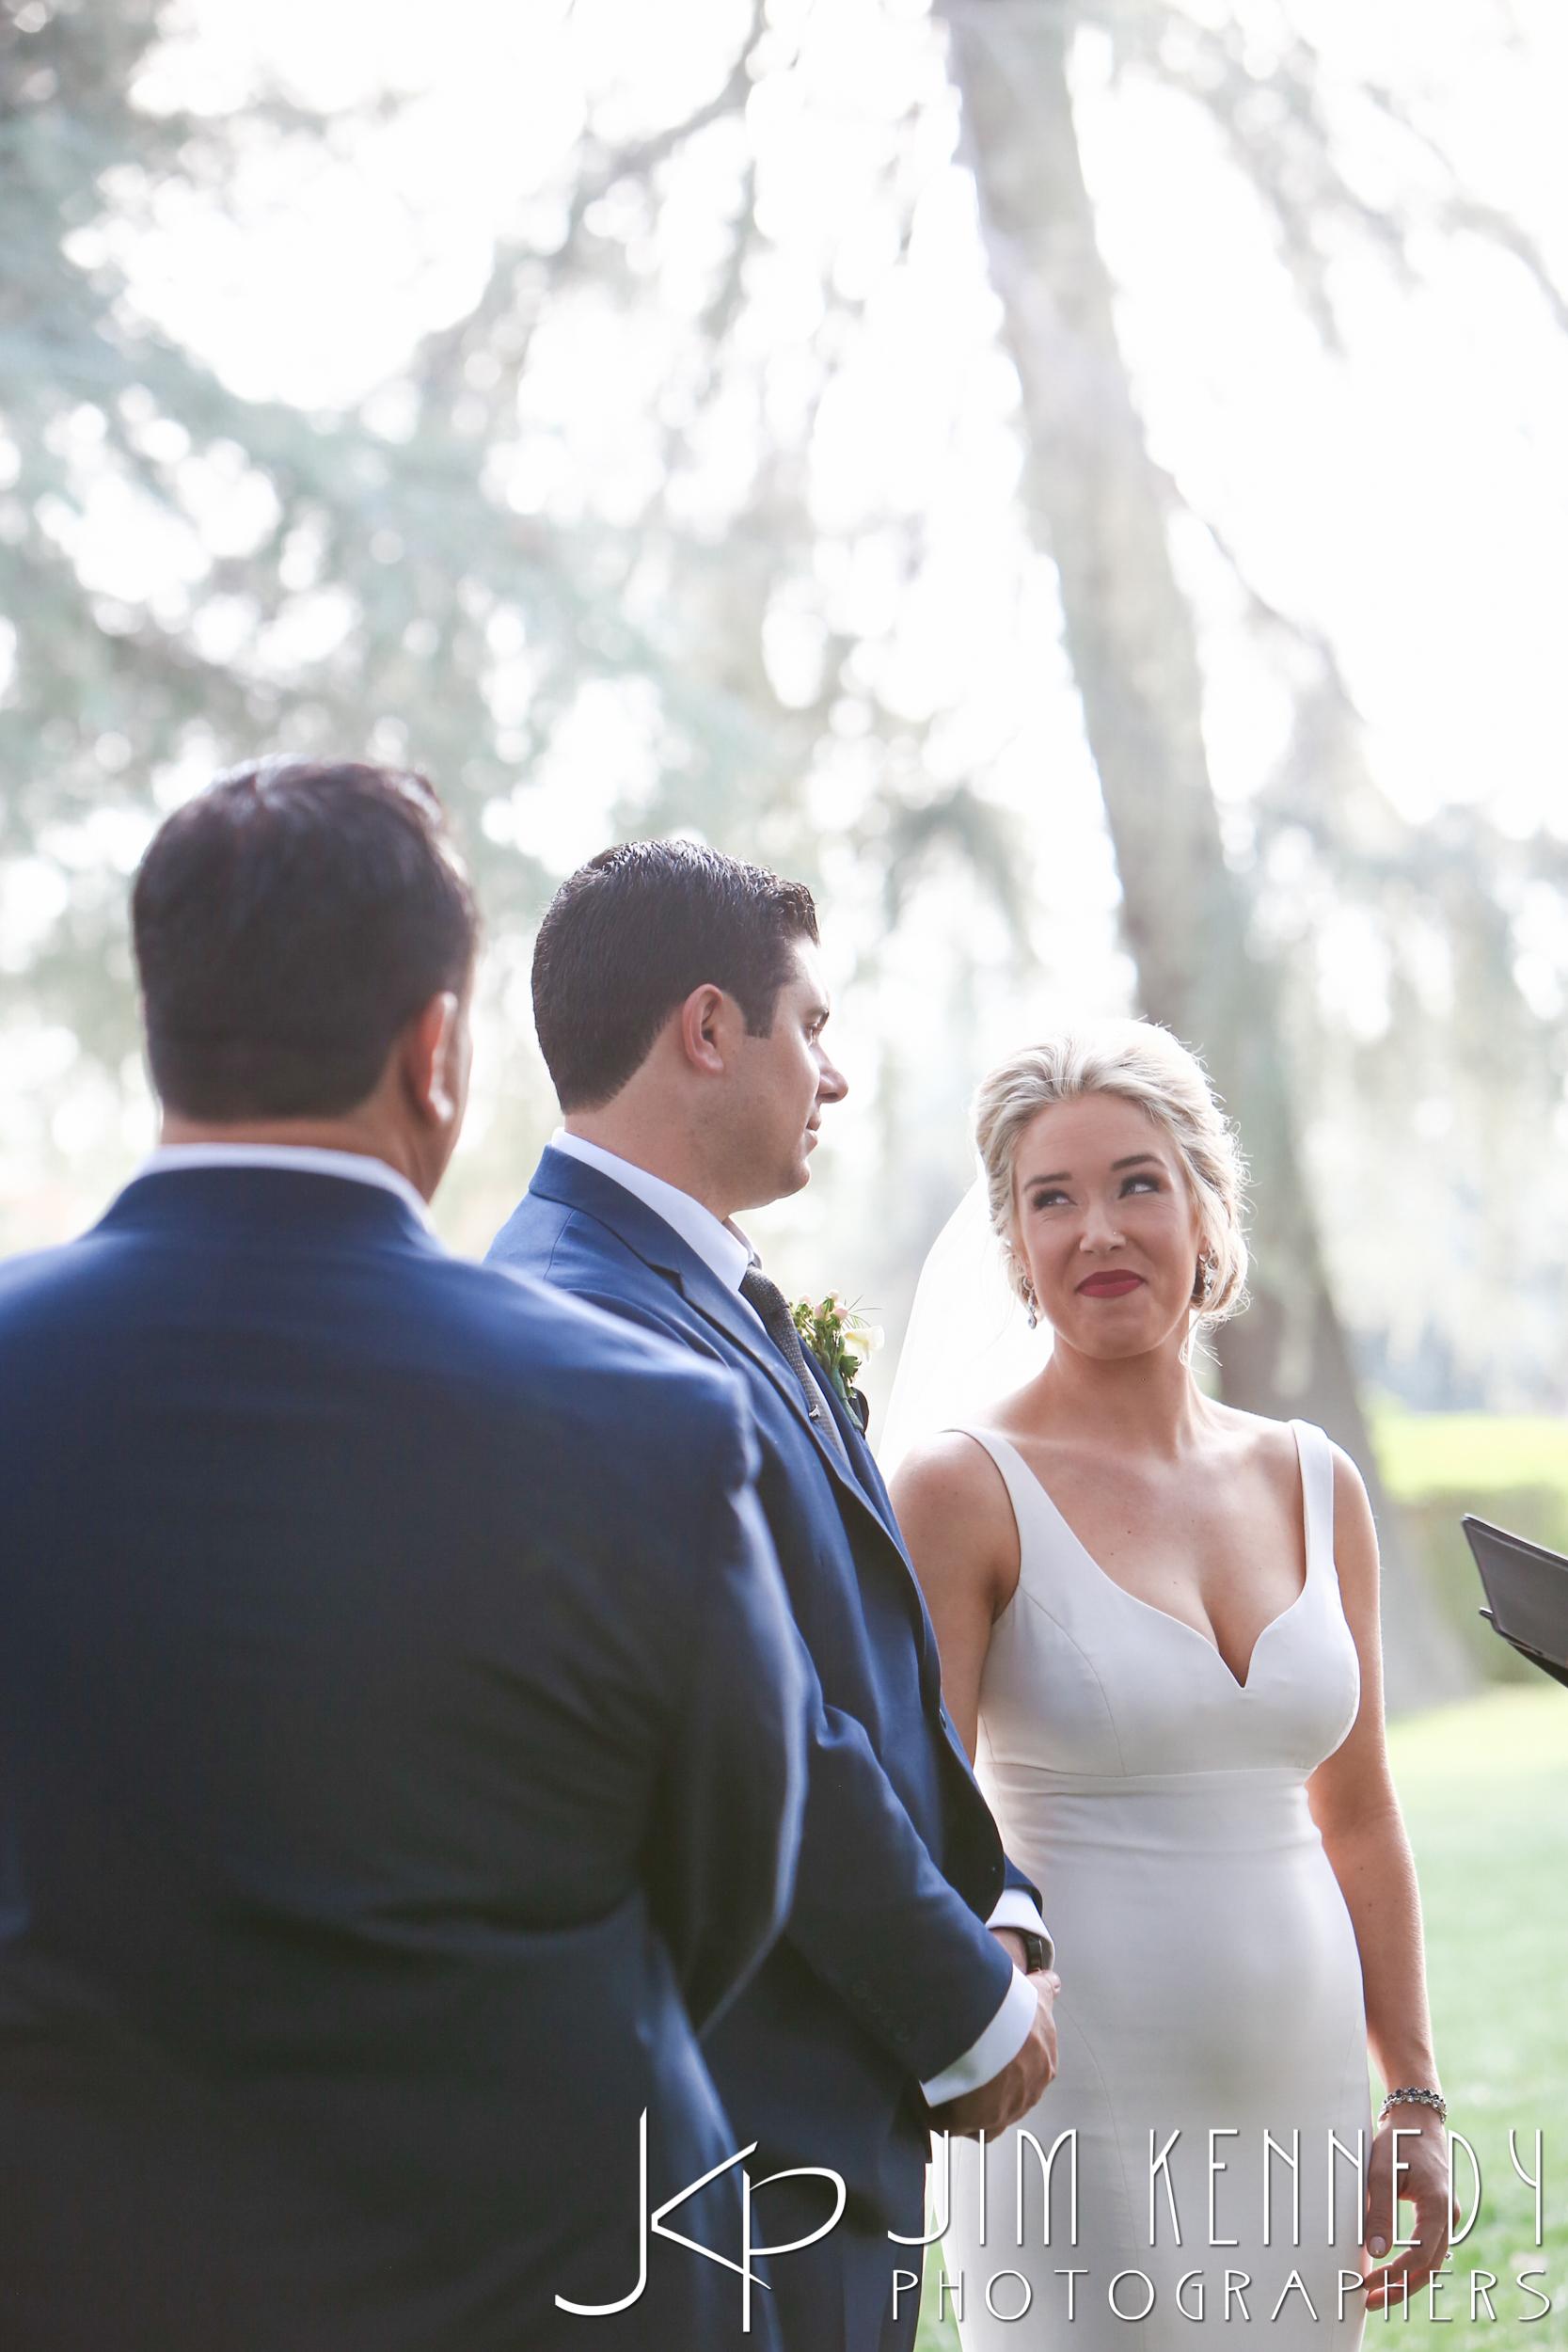 jim_kennedy_photographers_highland_springs_wedding_caitlyn_0083.jpg